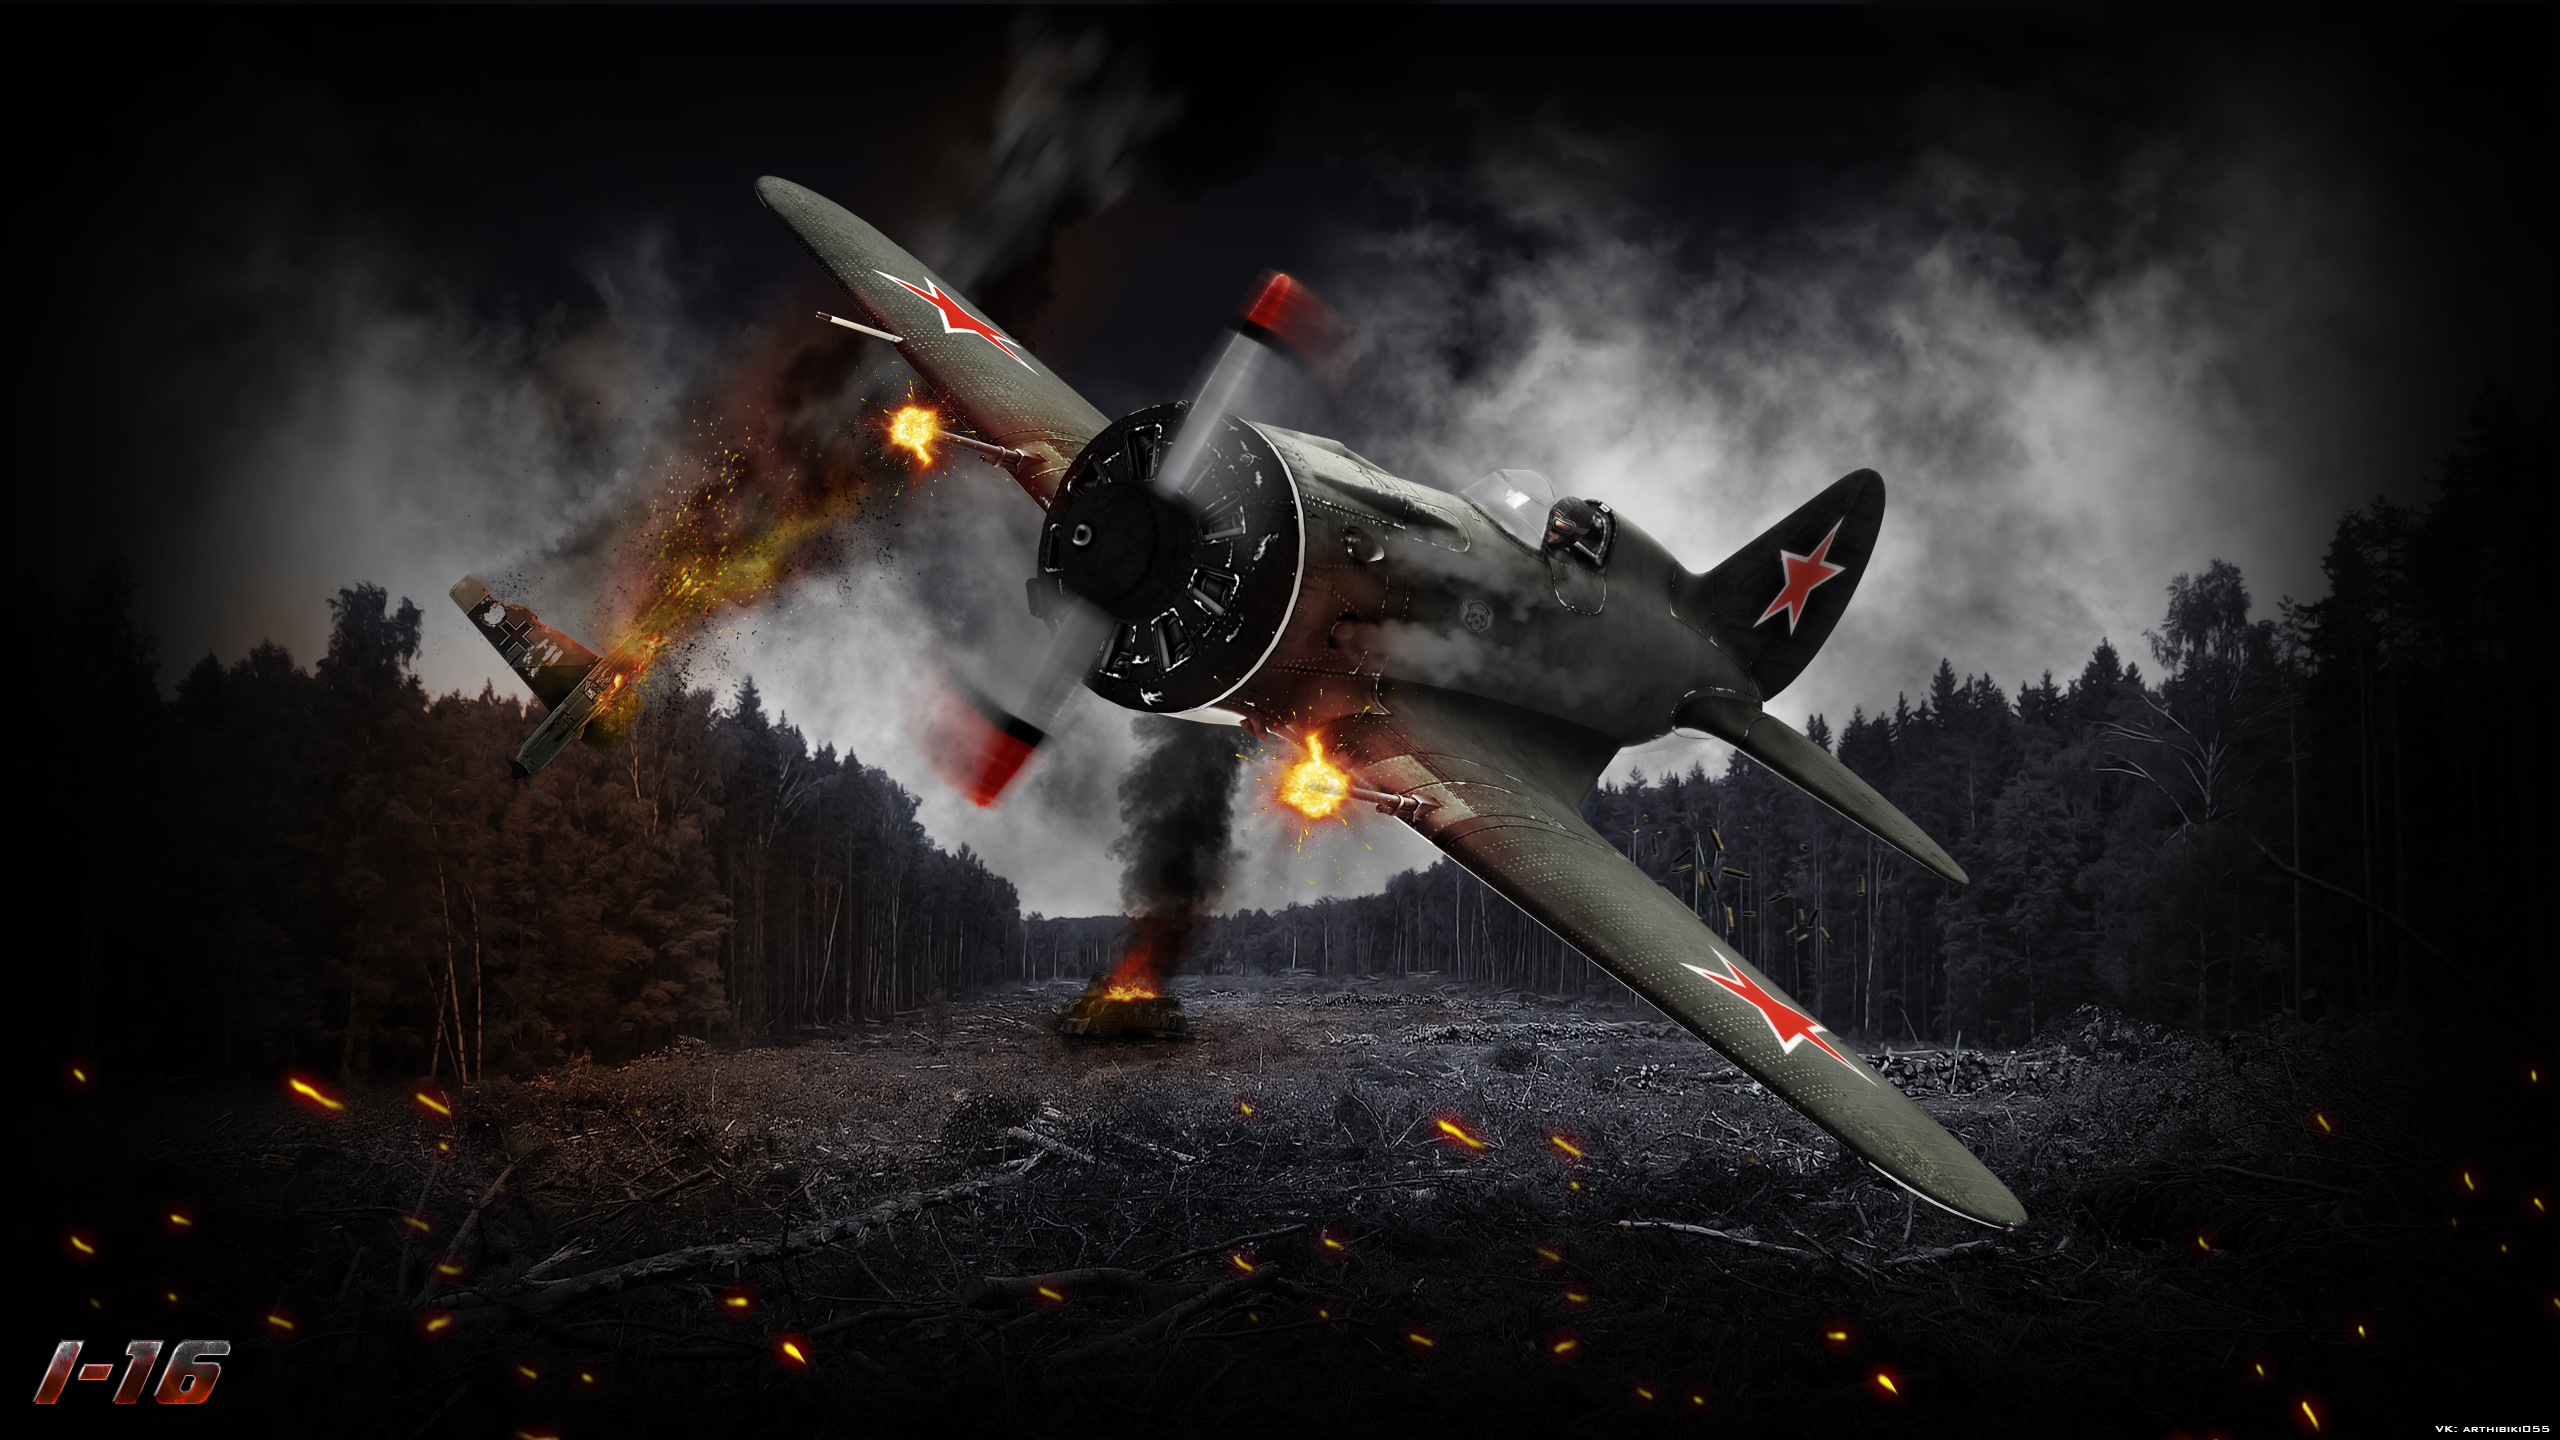 War Thunder Wallpaper 1600x900 - WallpaperSafari